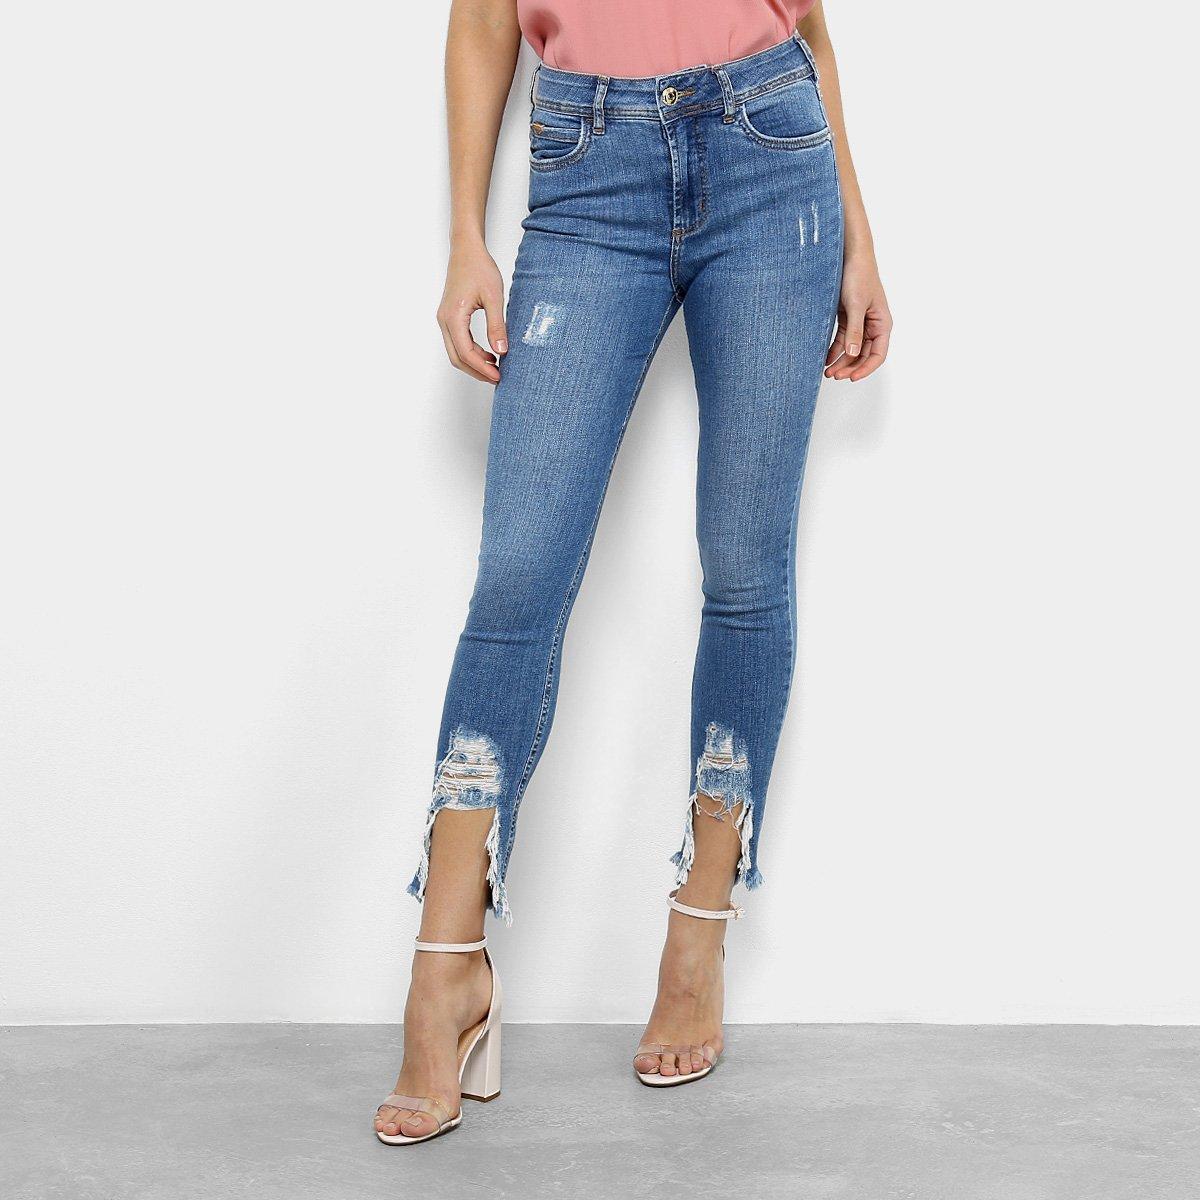 4cac2966c Calça Jeans Skinny Colcci Bia Estonada Barra Destroyed Cintura Média  Feminina